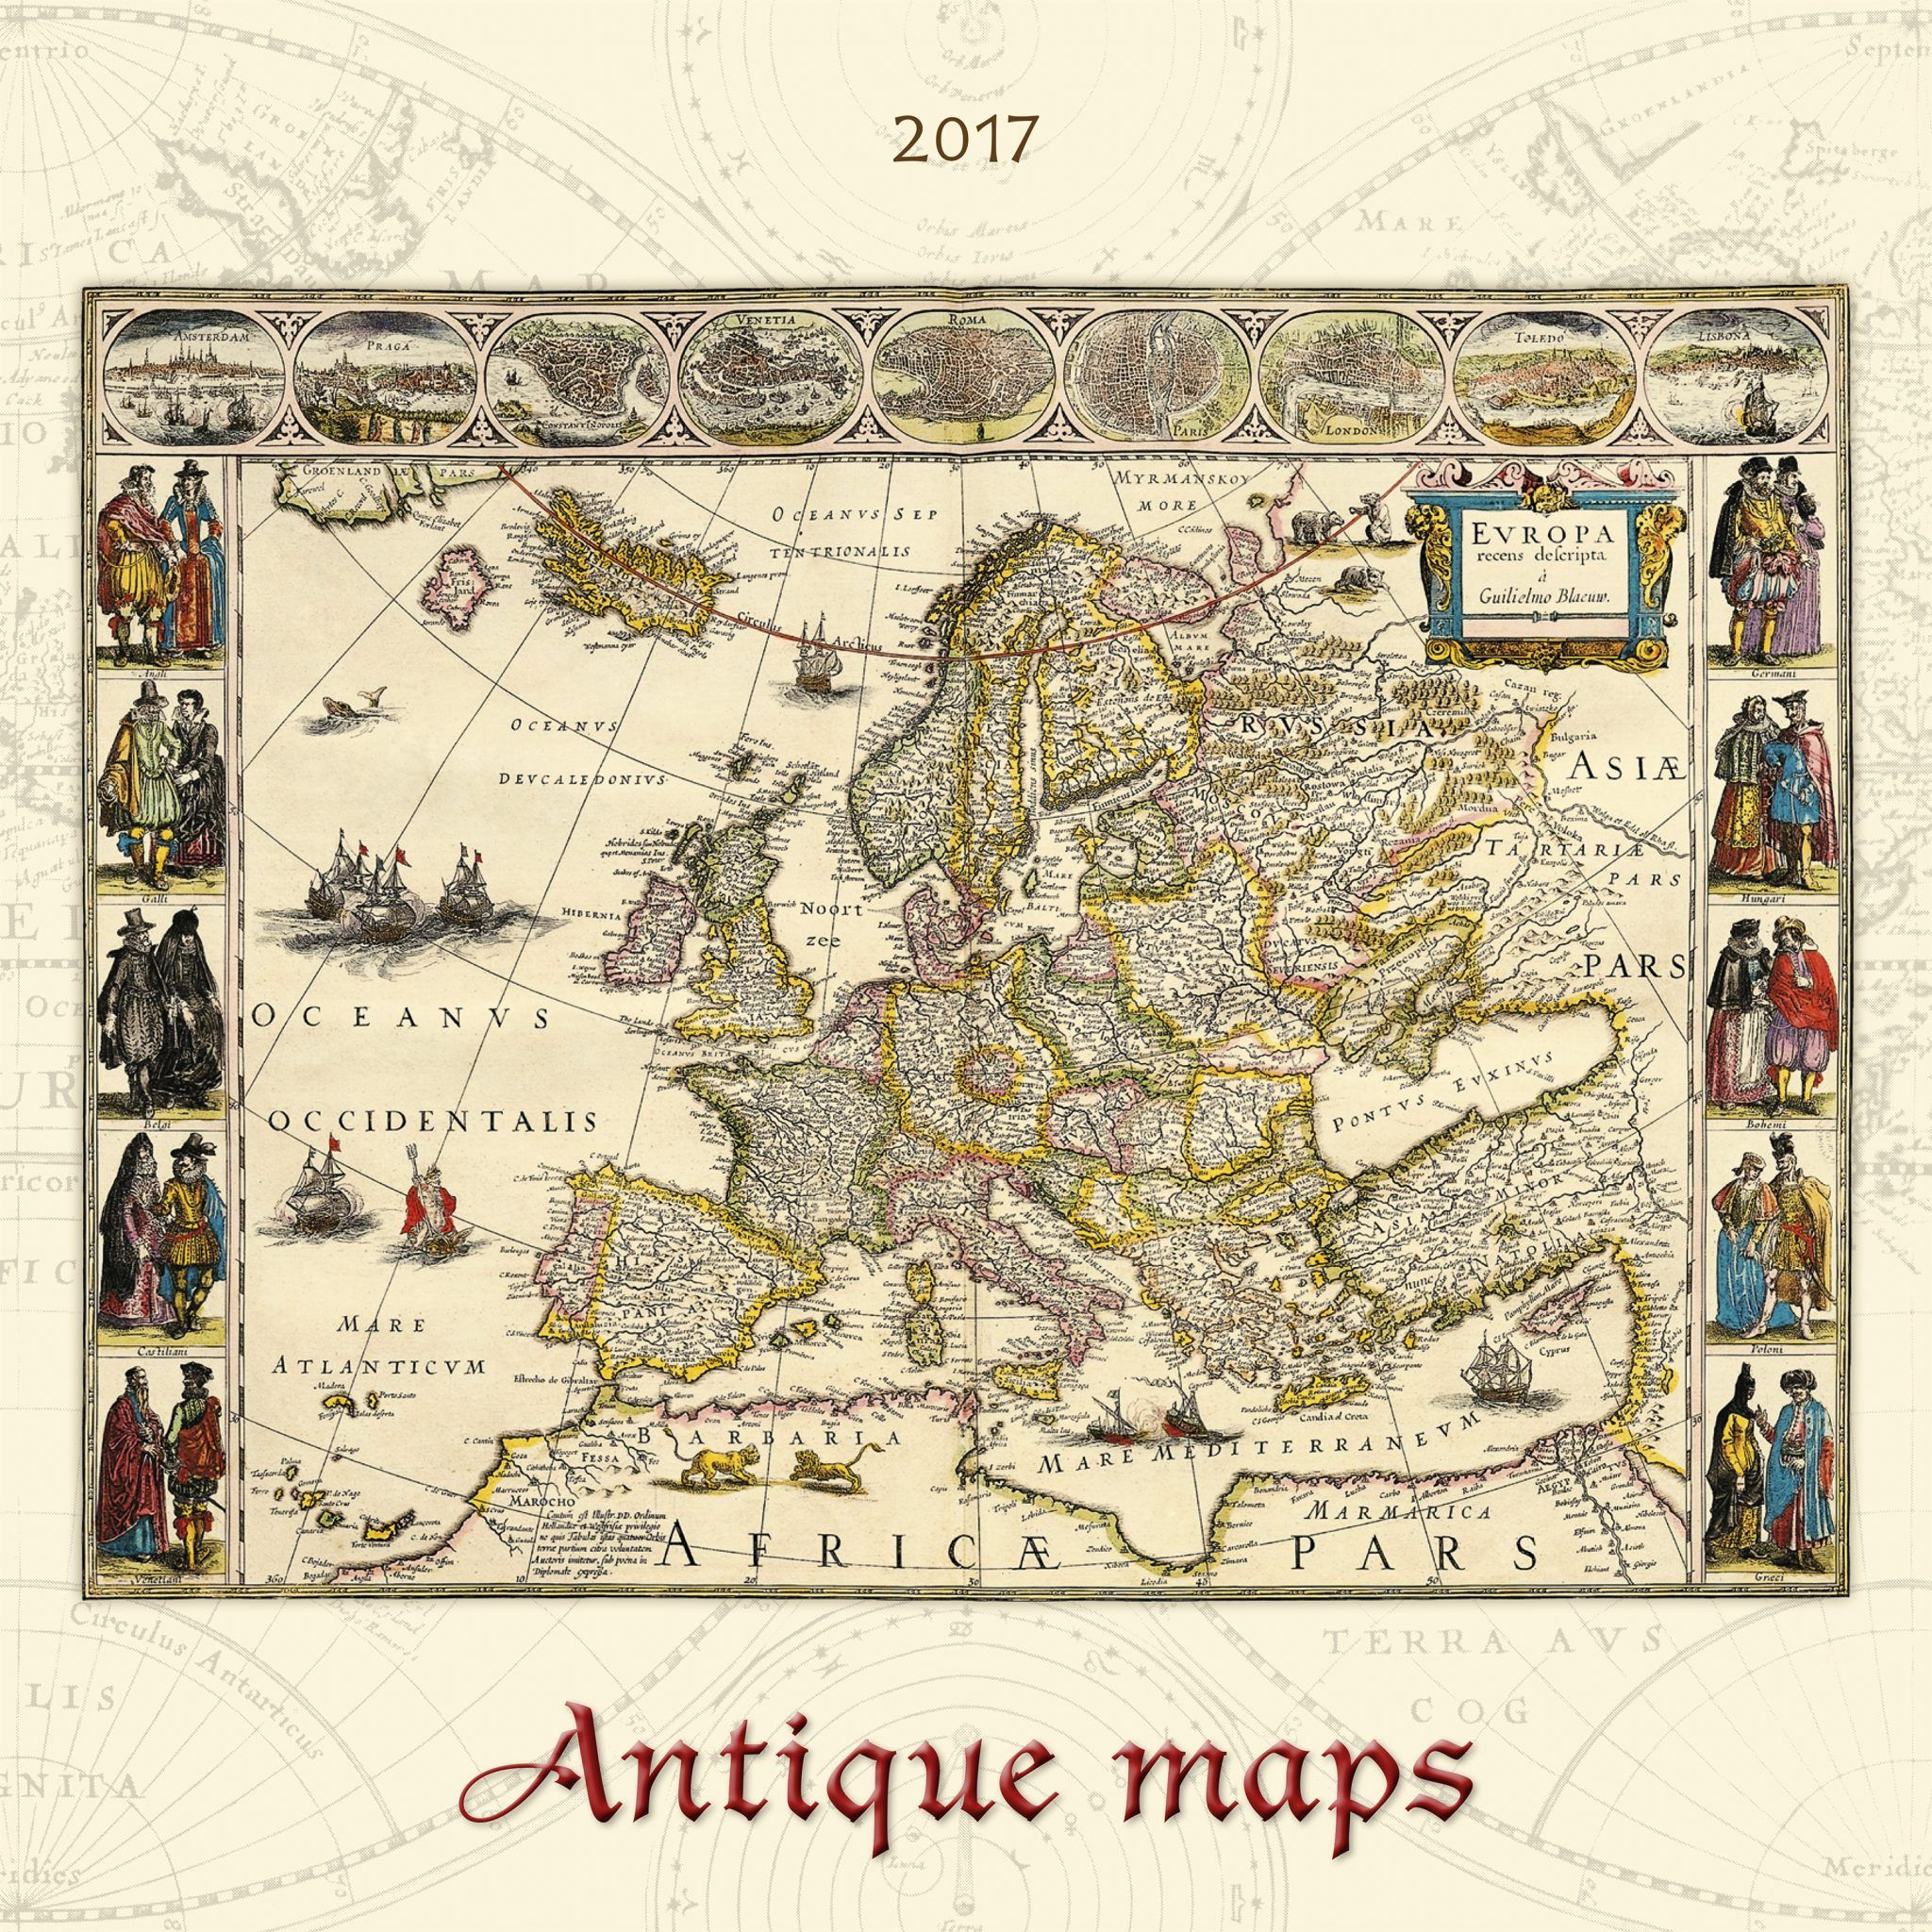 ANTIQUE MAPS х мм листов спираль Отпечатано в Европе - Antique maps amsterdam